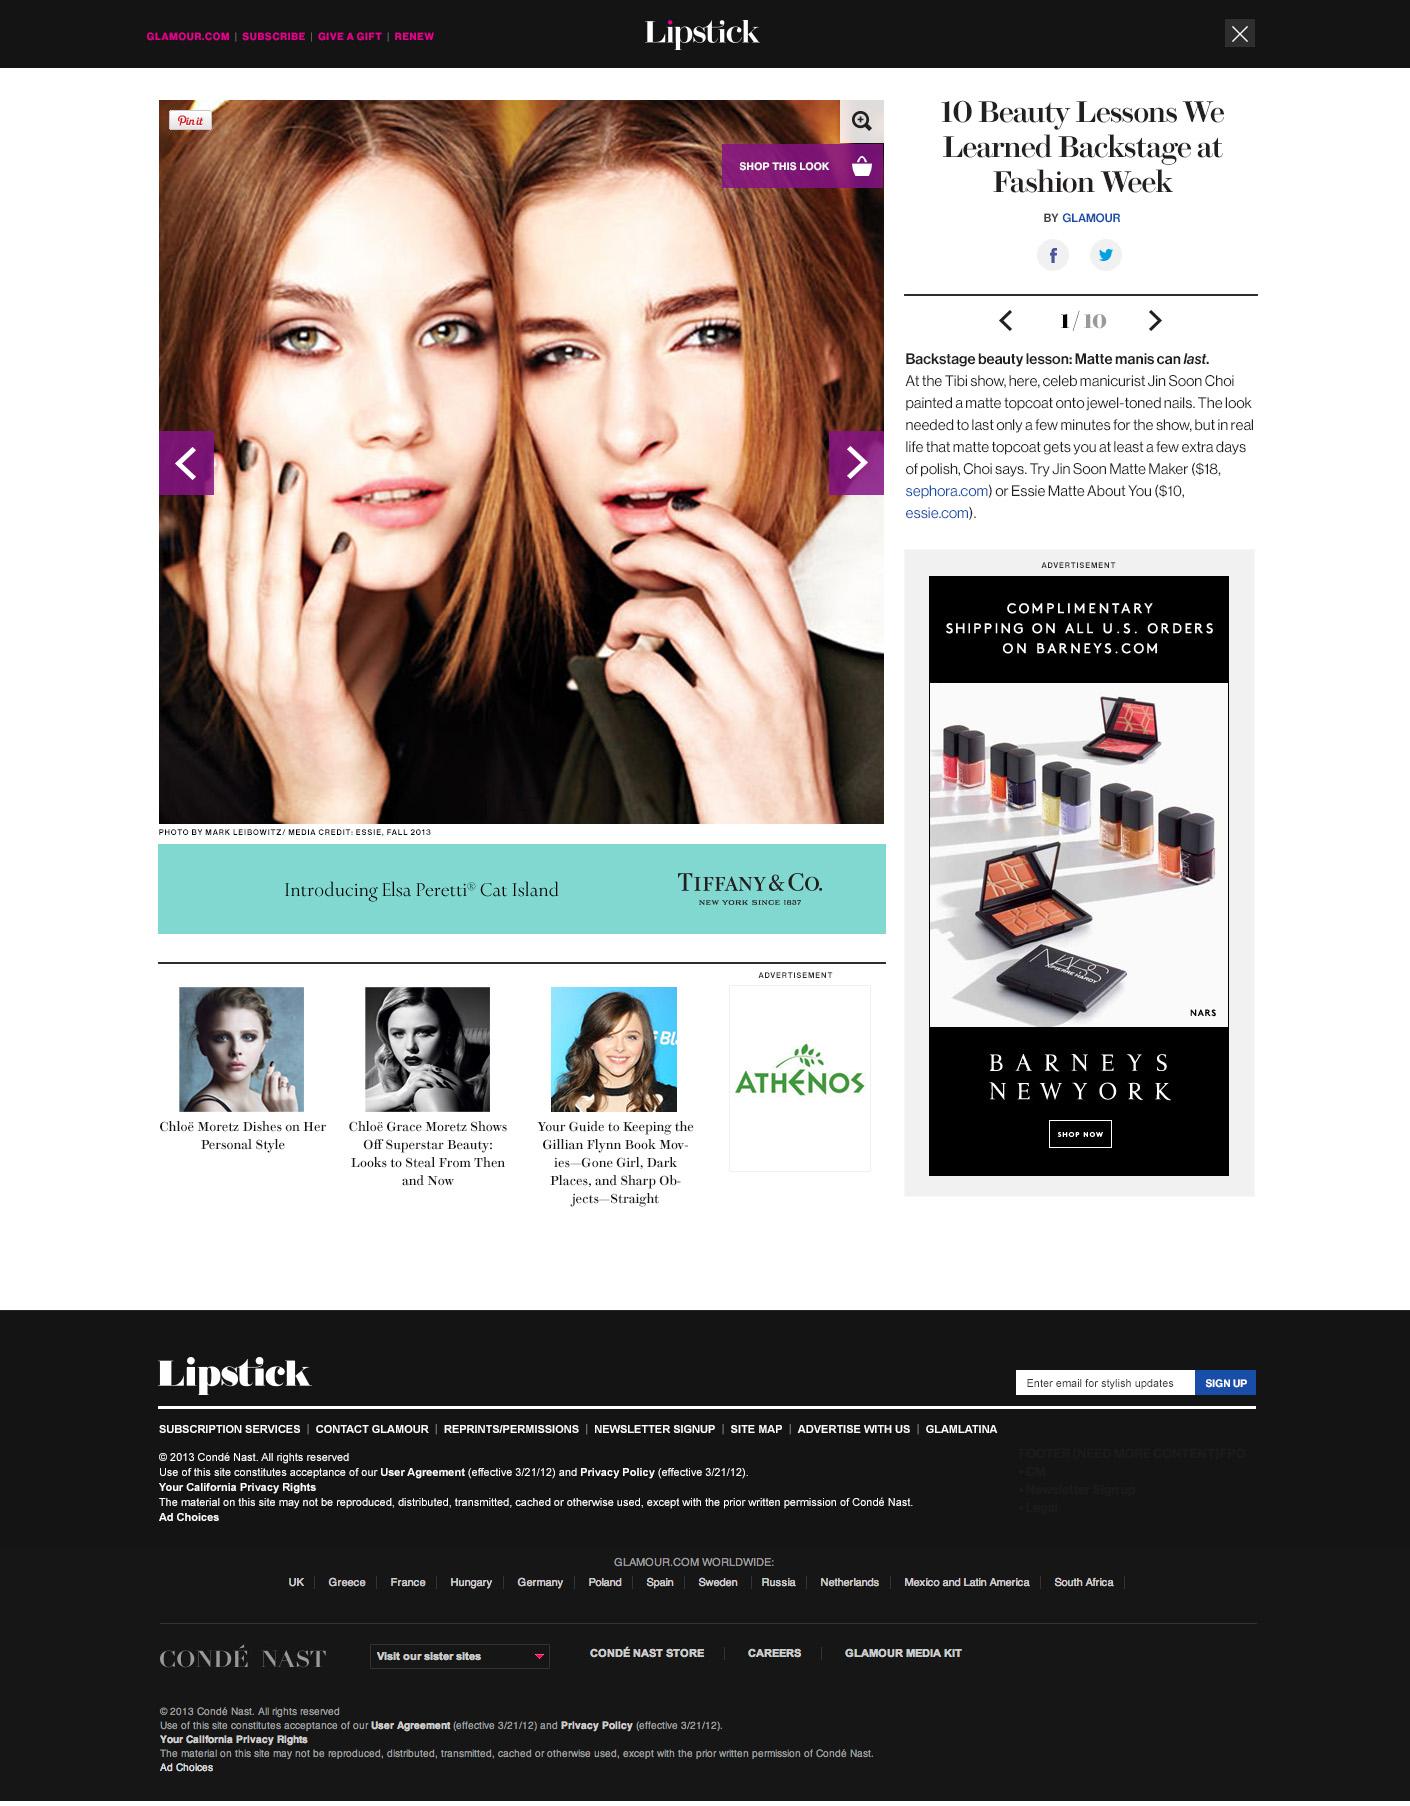 Lipstick_Slideshowf_1_1_1.jpg